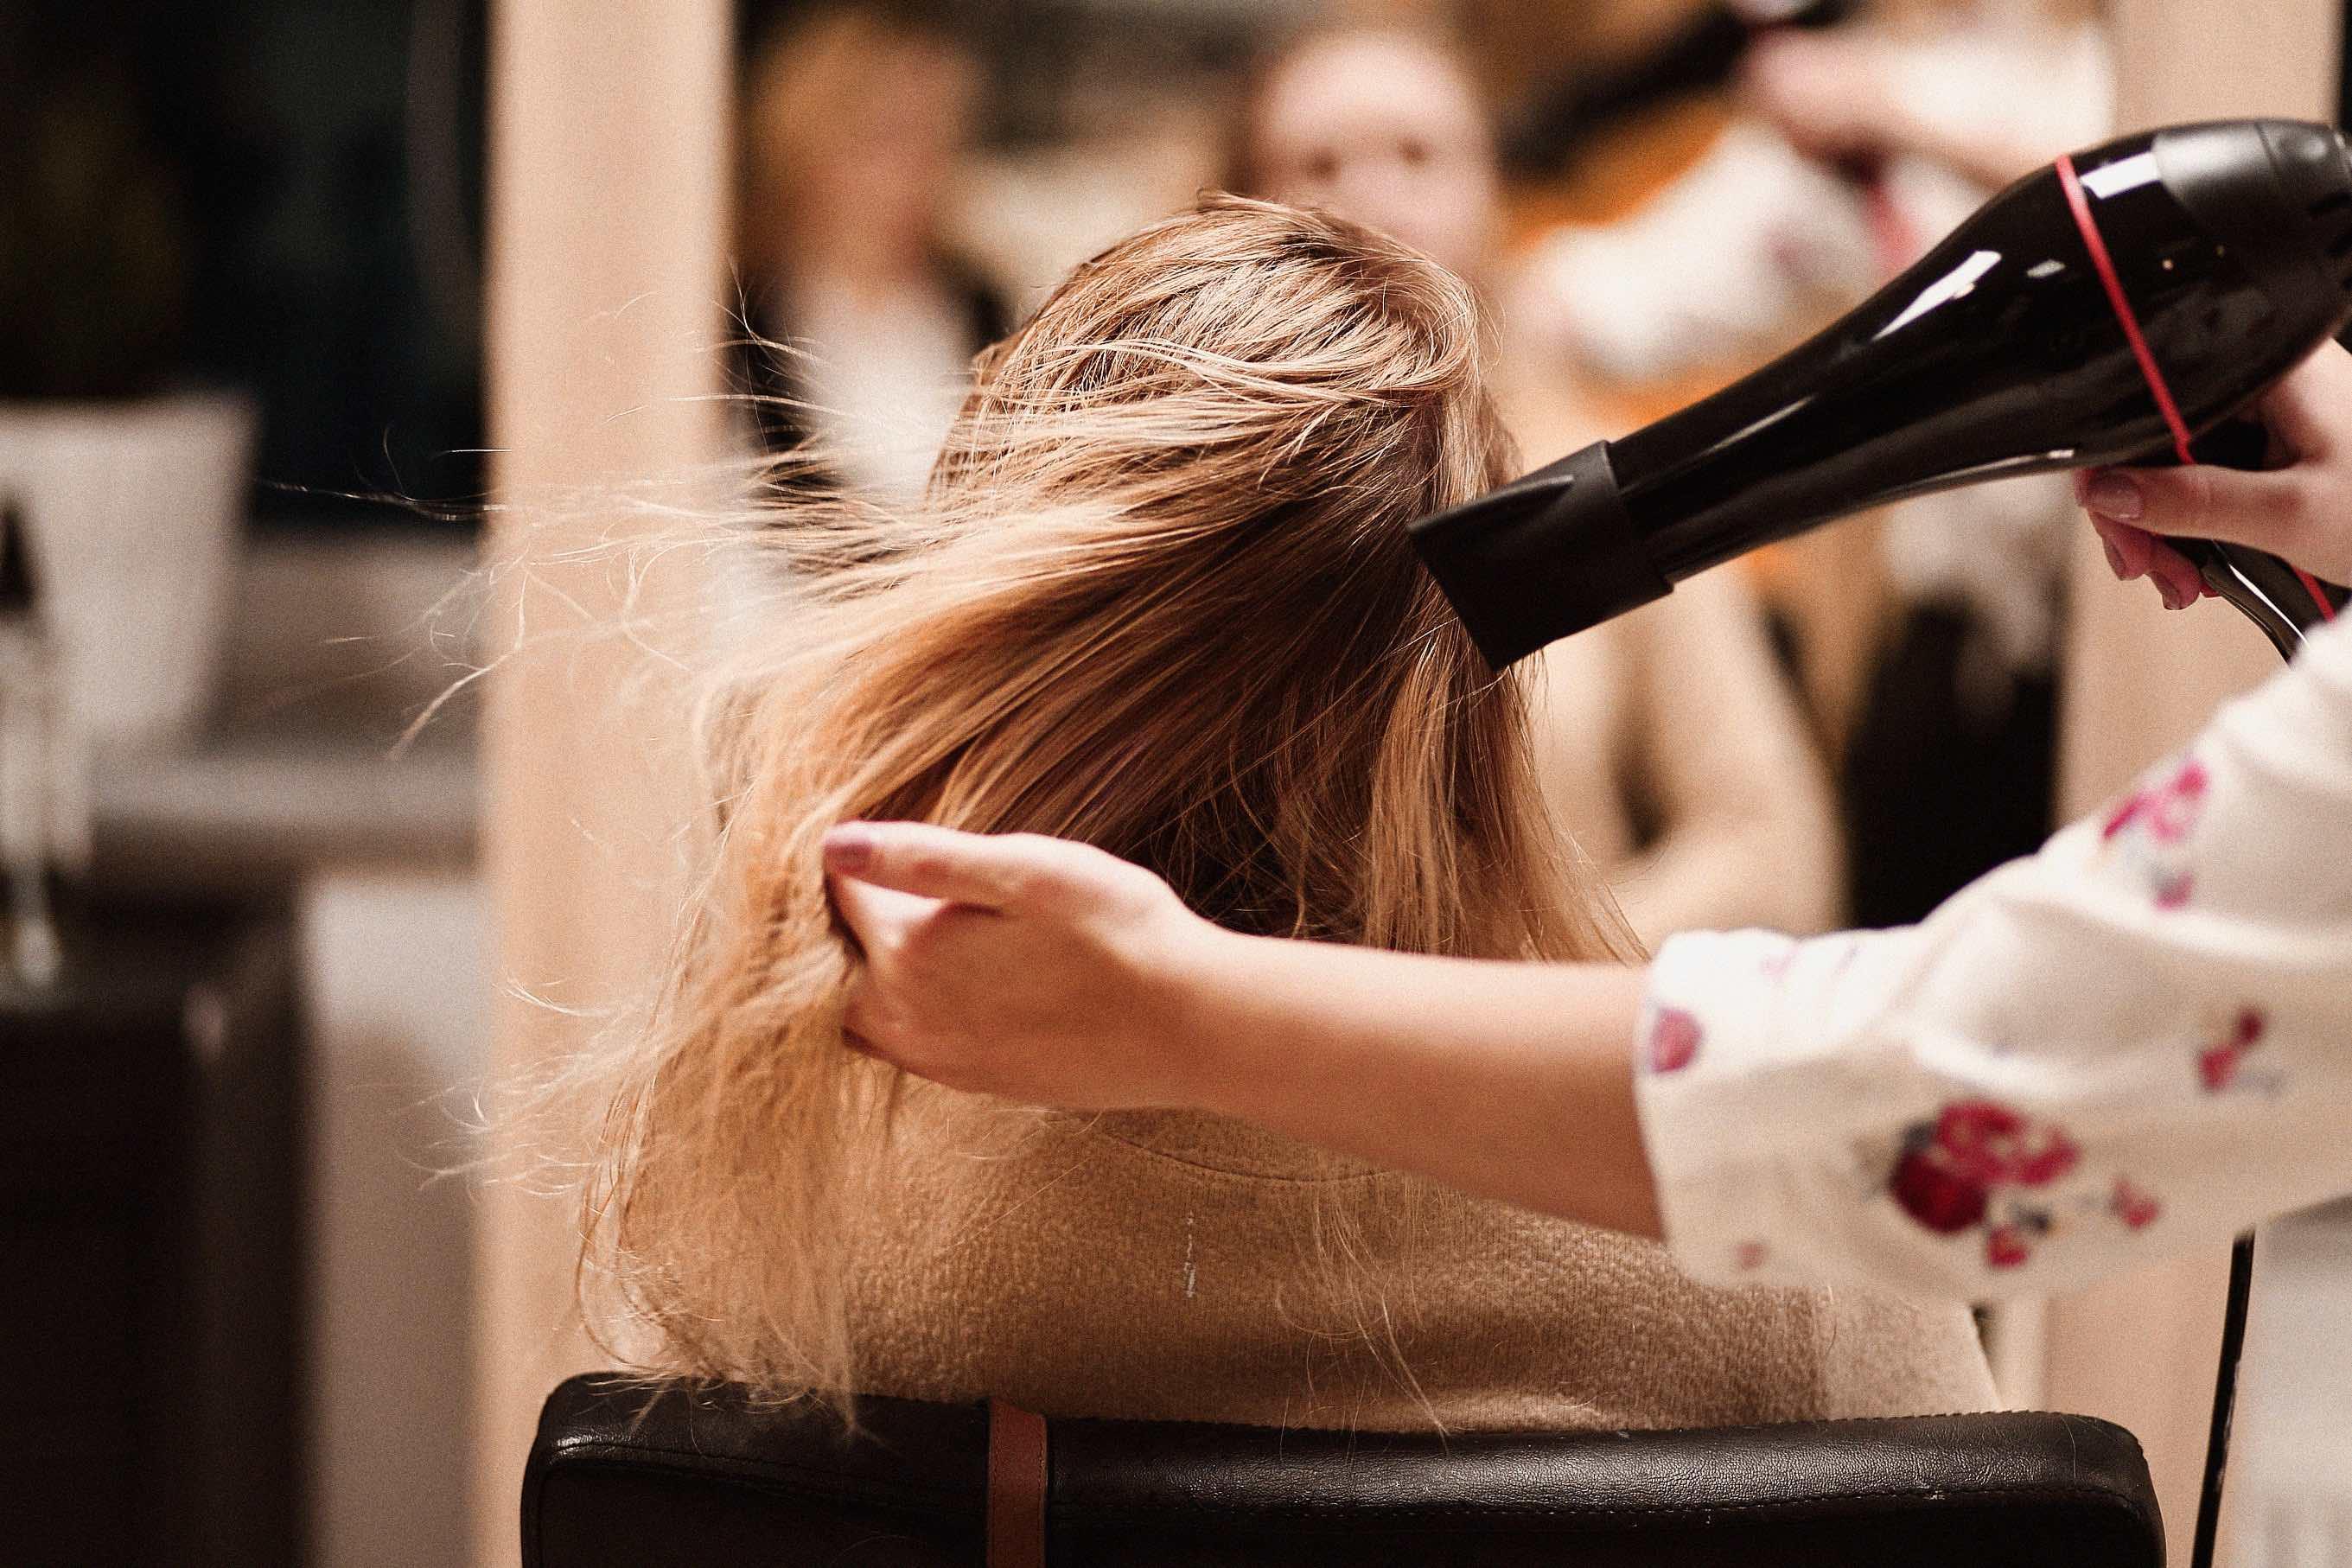 Trendy fryzjerskie na 2020 rok